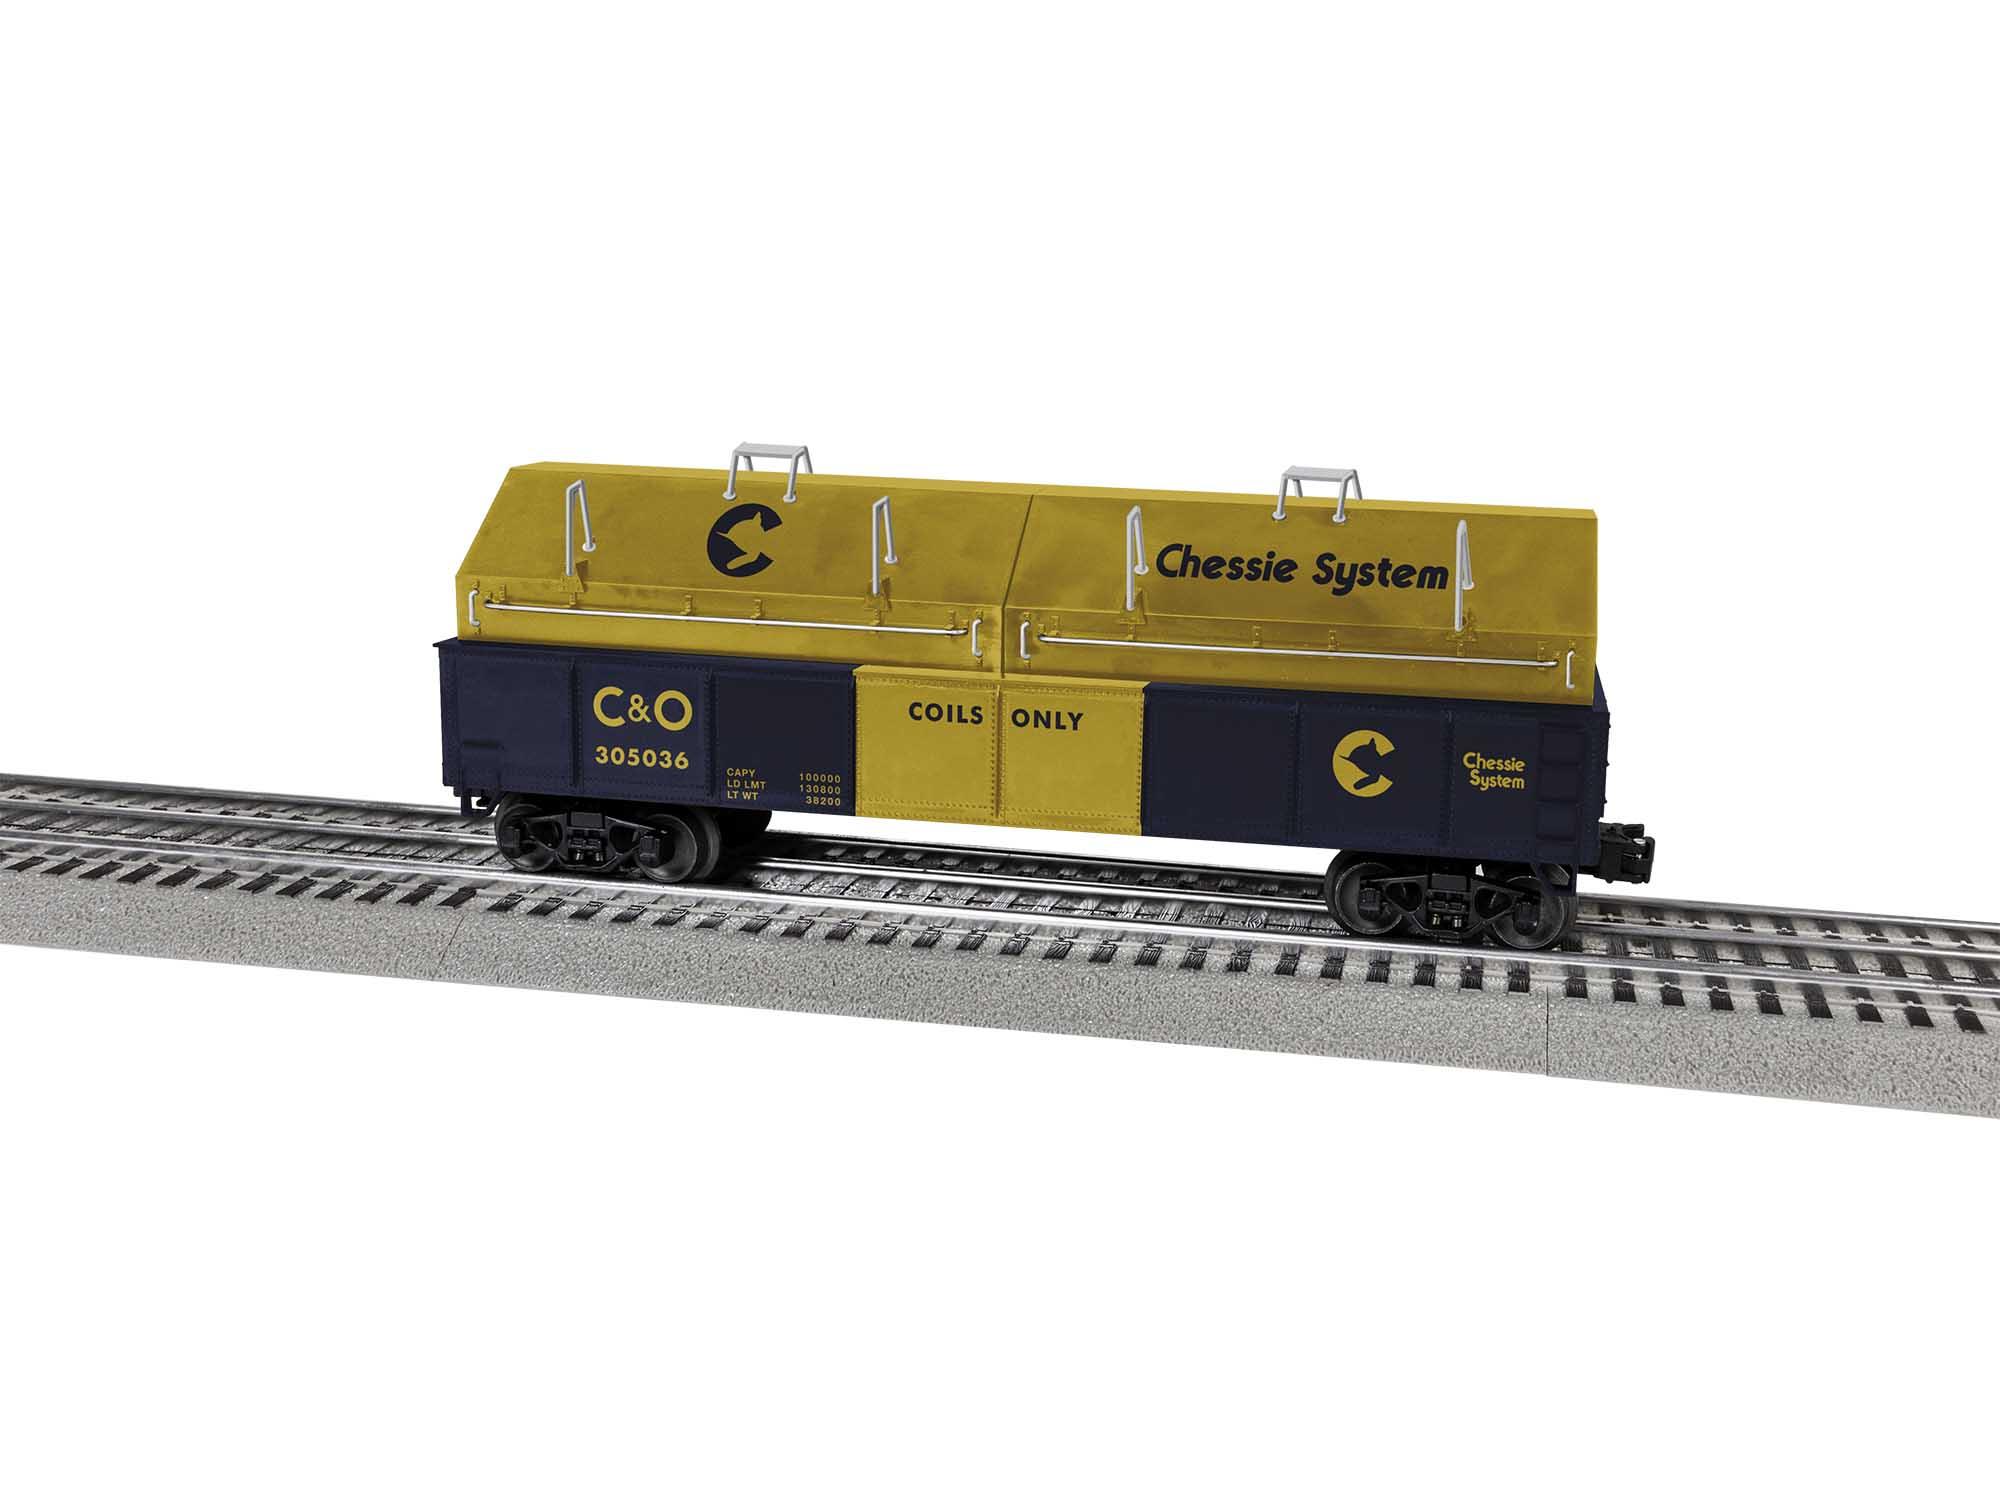 Lionel 2043143 O Gondola Chessie System #305036